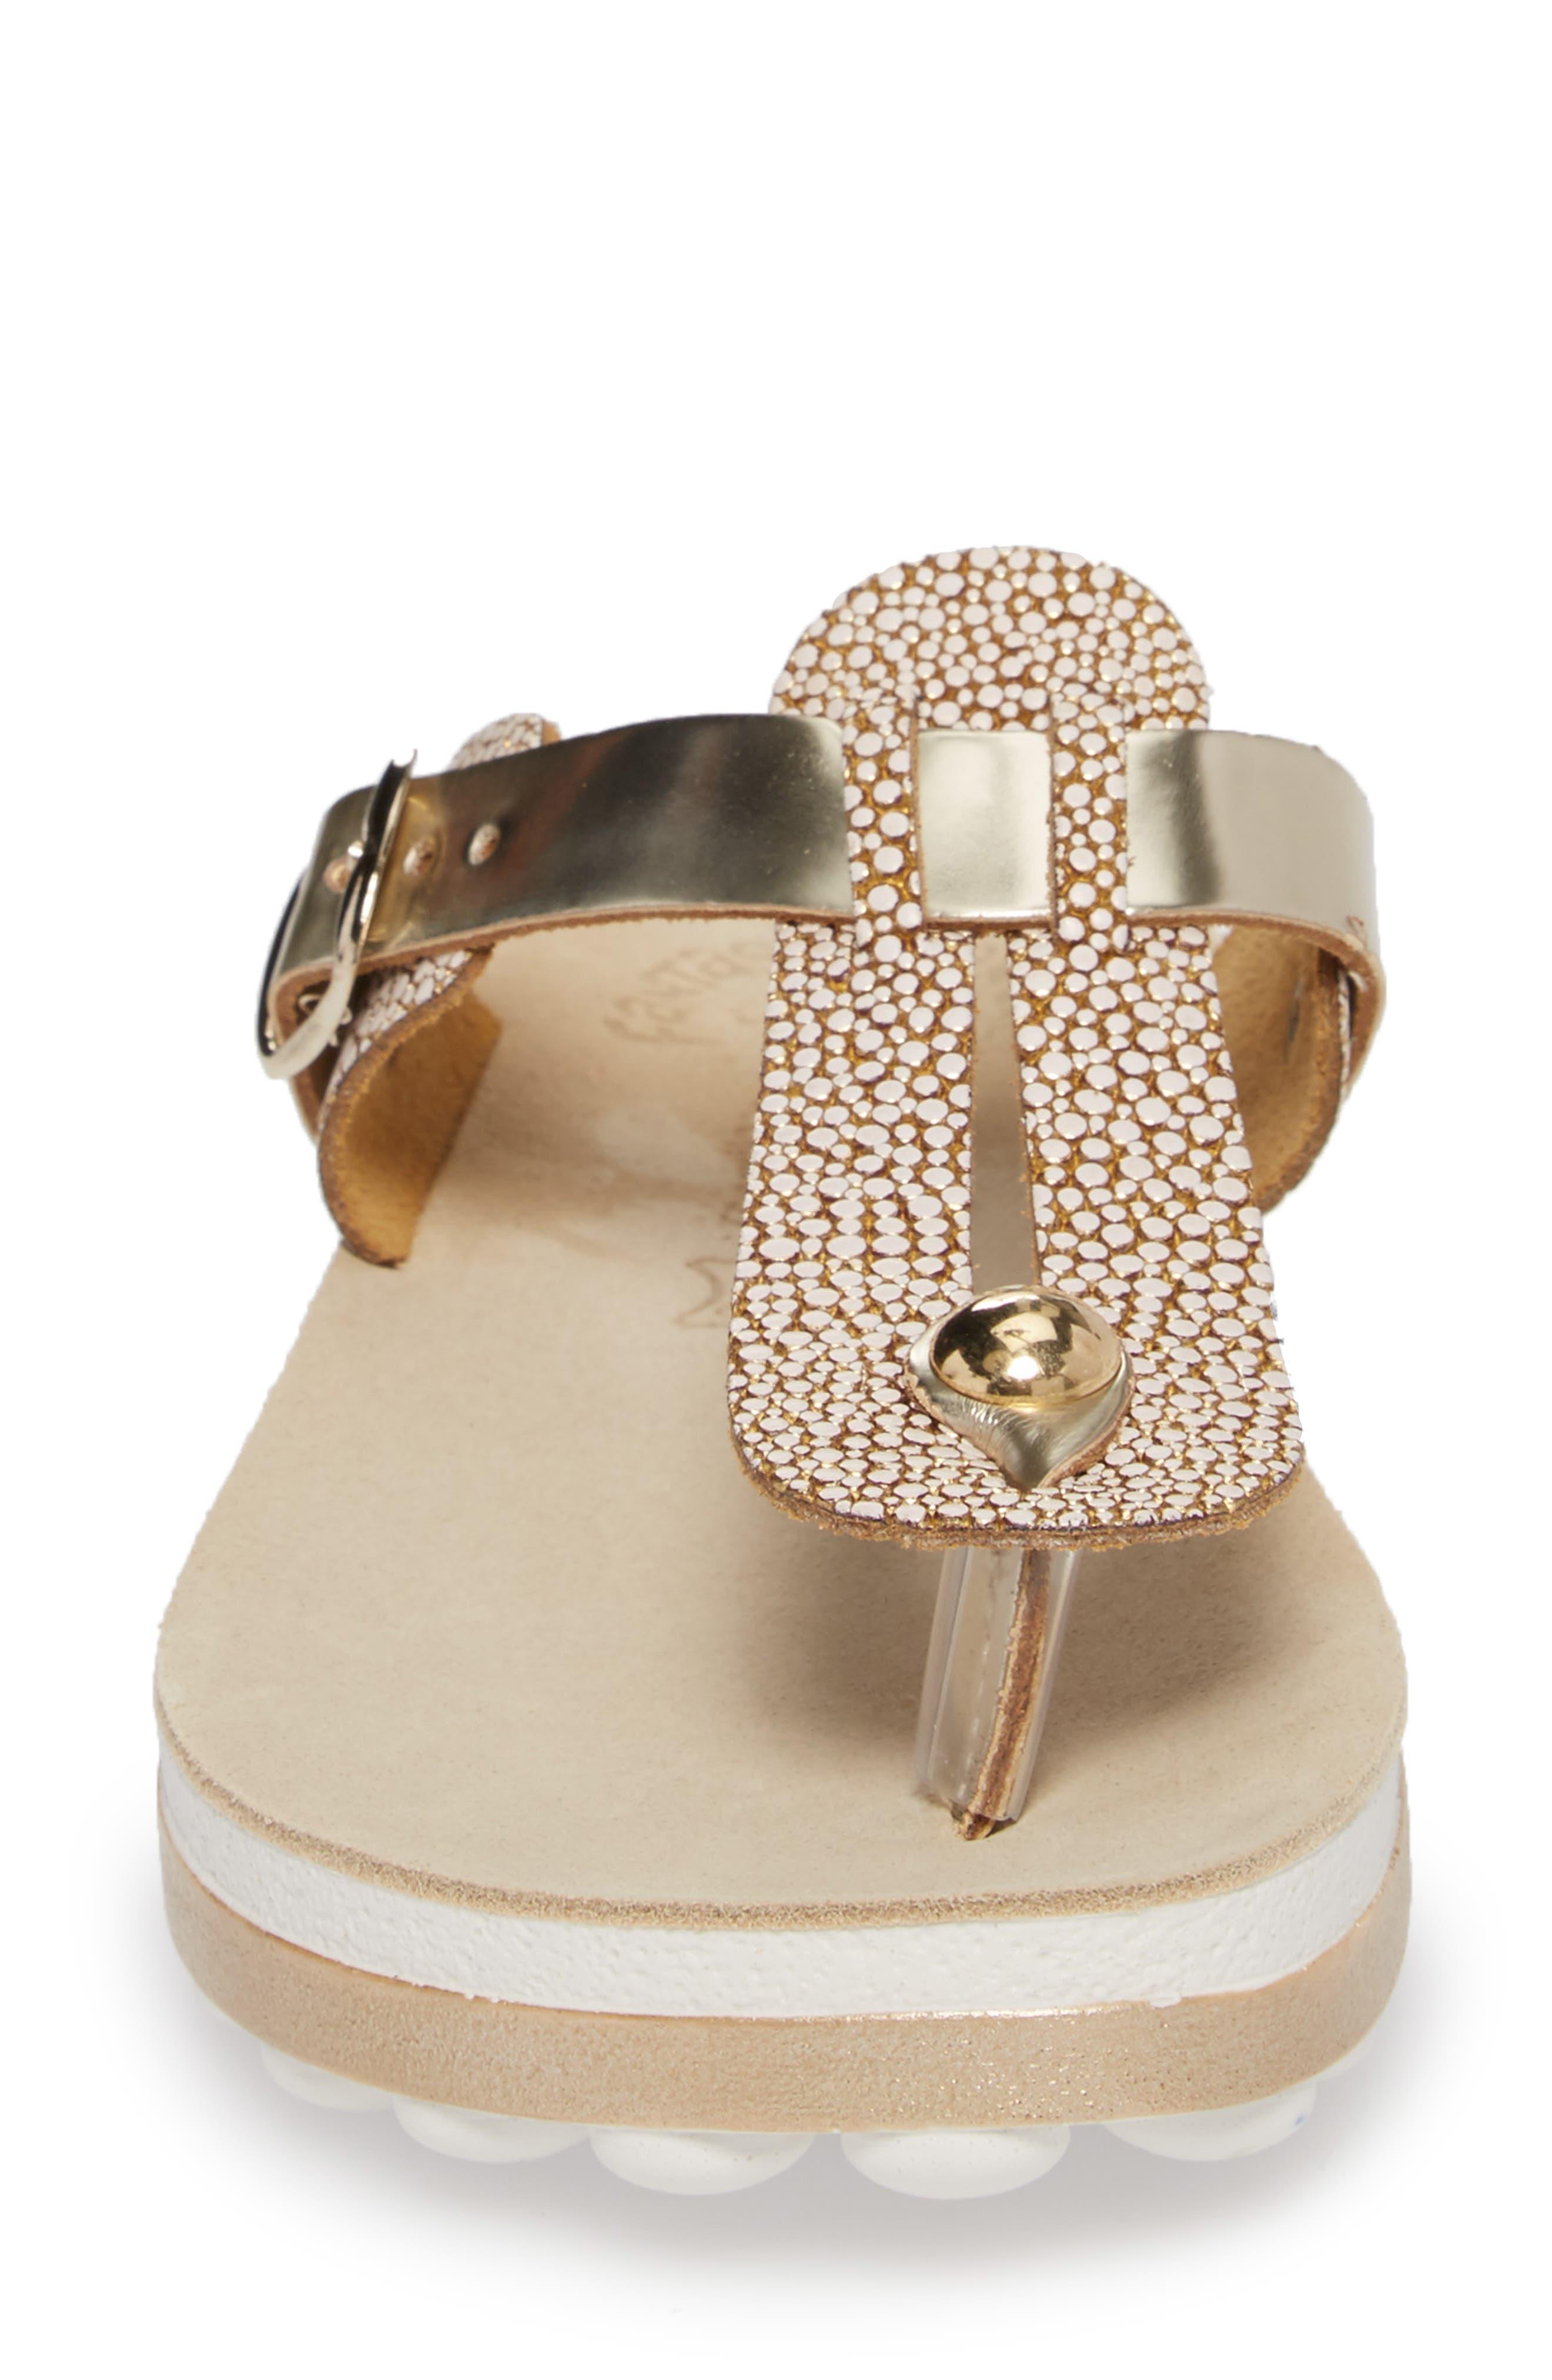 Mirabella Fantasy Sandal,                             Alternate thumbnail 4, color,                             Gold Caviar Leather